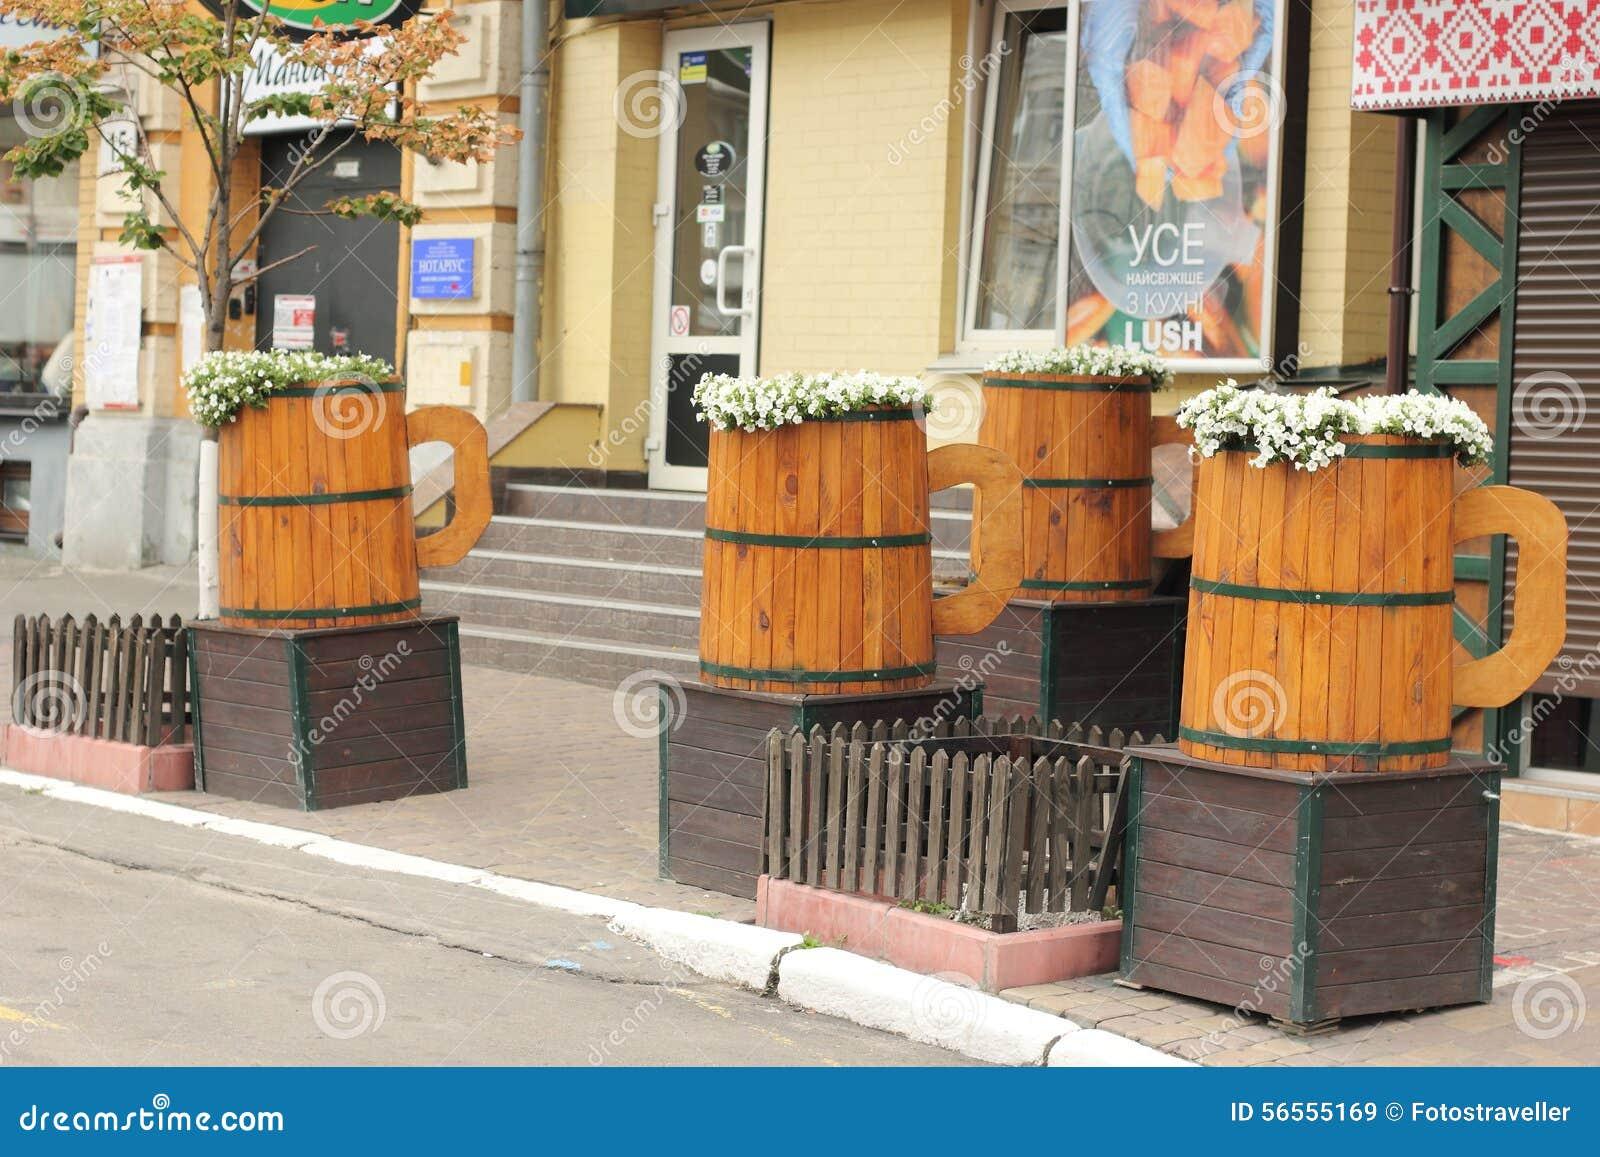 Download Coleus σπορείων ανθίζει άλλων Pansies Εκδοτική Στοκ Εικόνα - εικόνα από διακοσμητικός, φρέσκος: 56555169